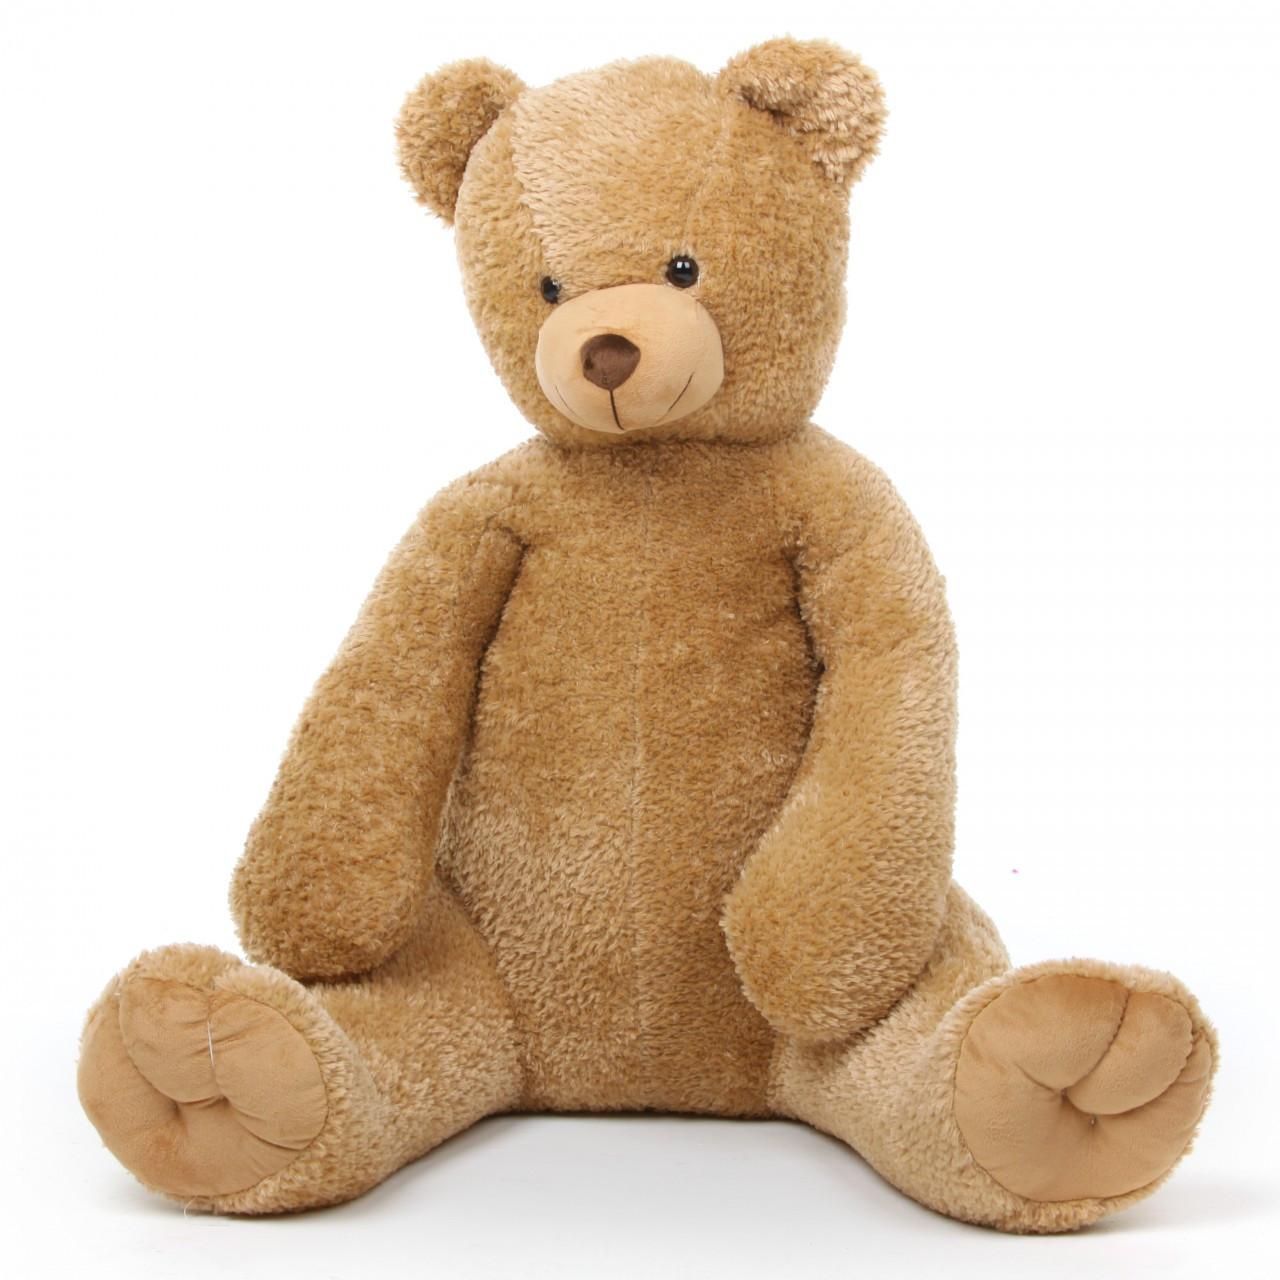 Honey Tubs 42 Large Amber Stuffed Teddy Bear Giant